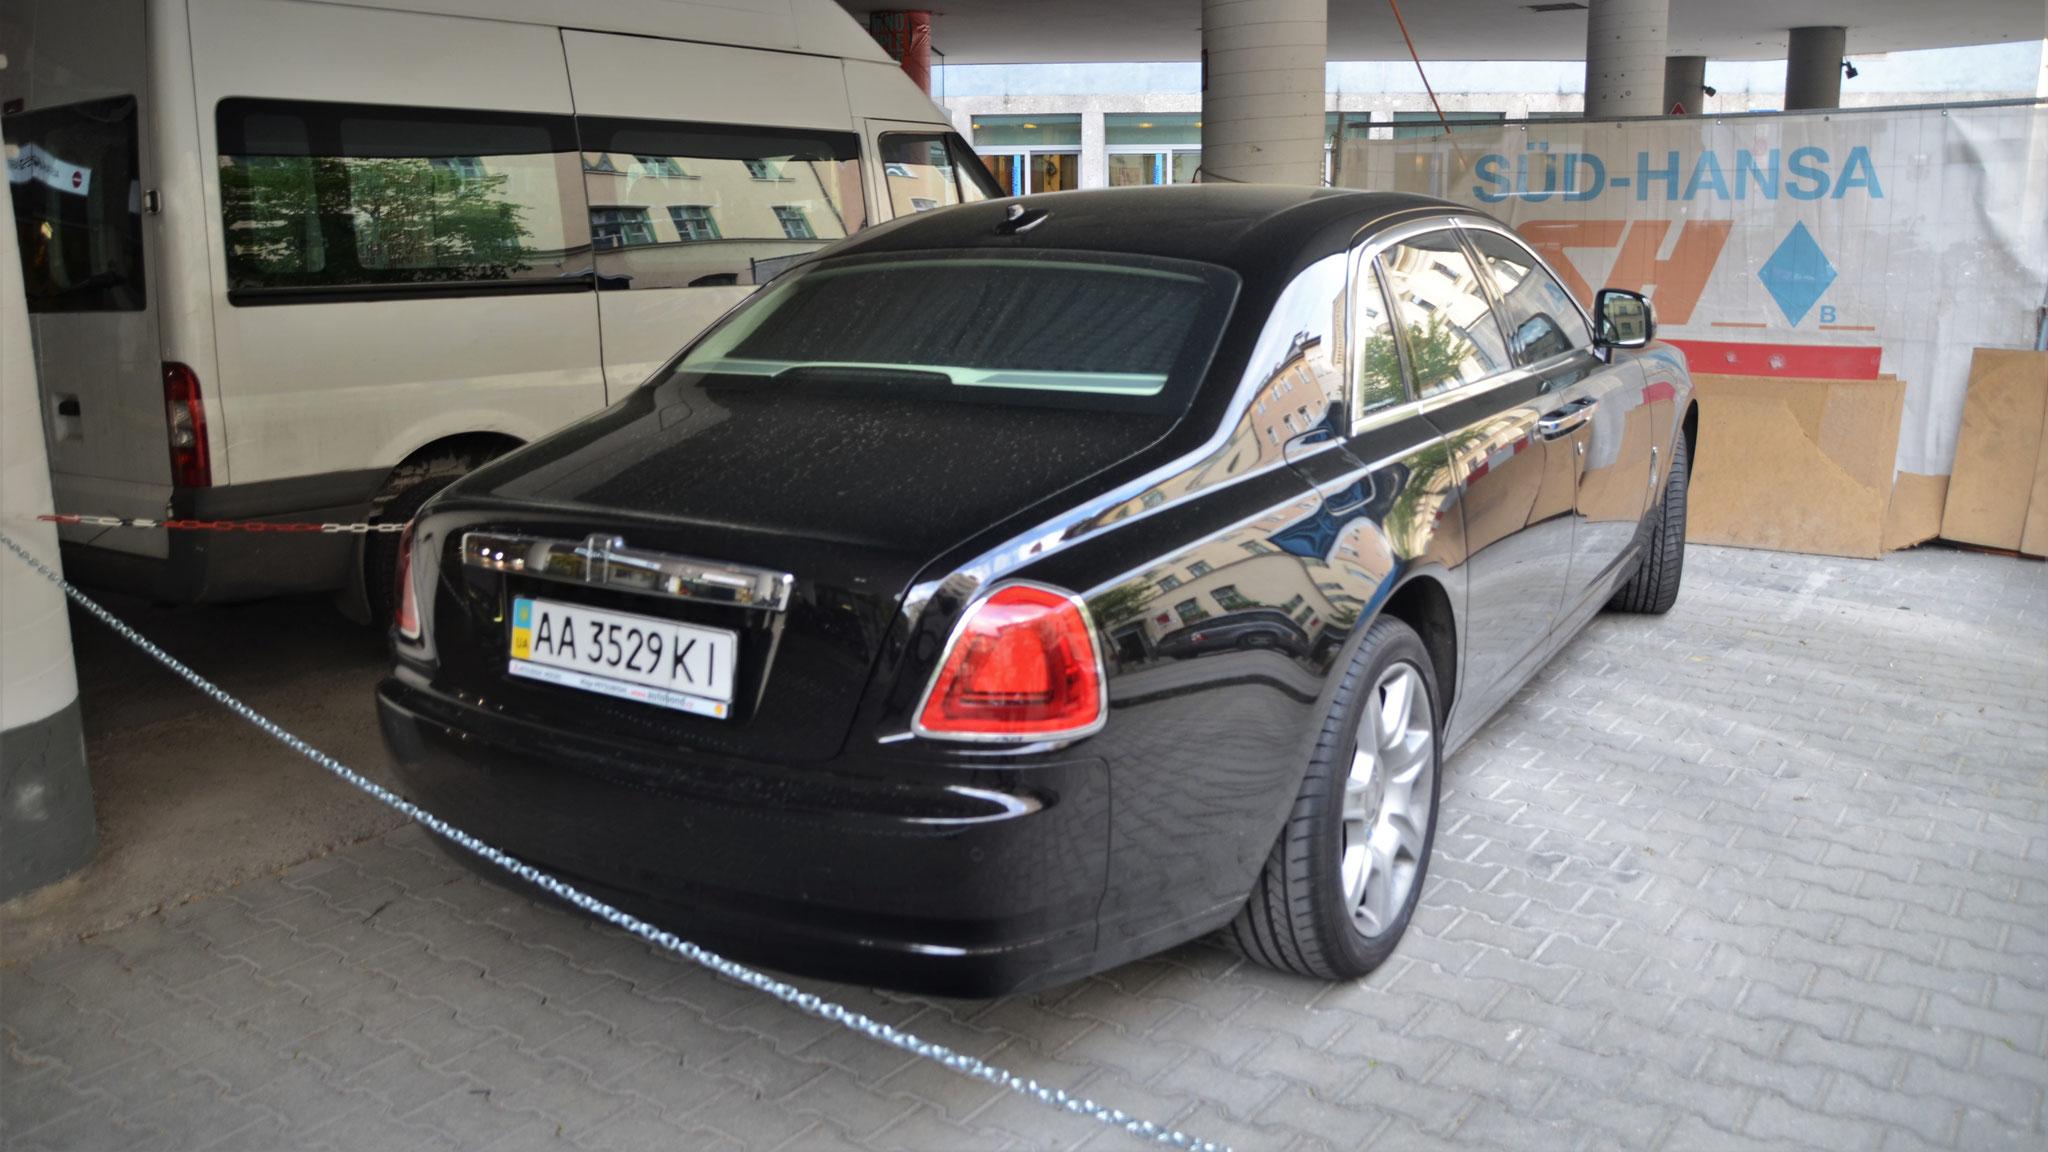 Rolls Royce Ghost - AA-3529-KI (UA)